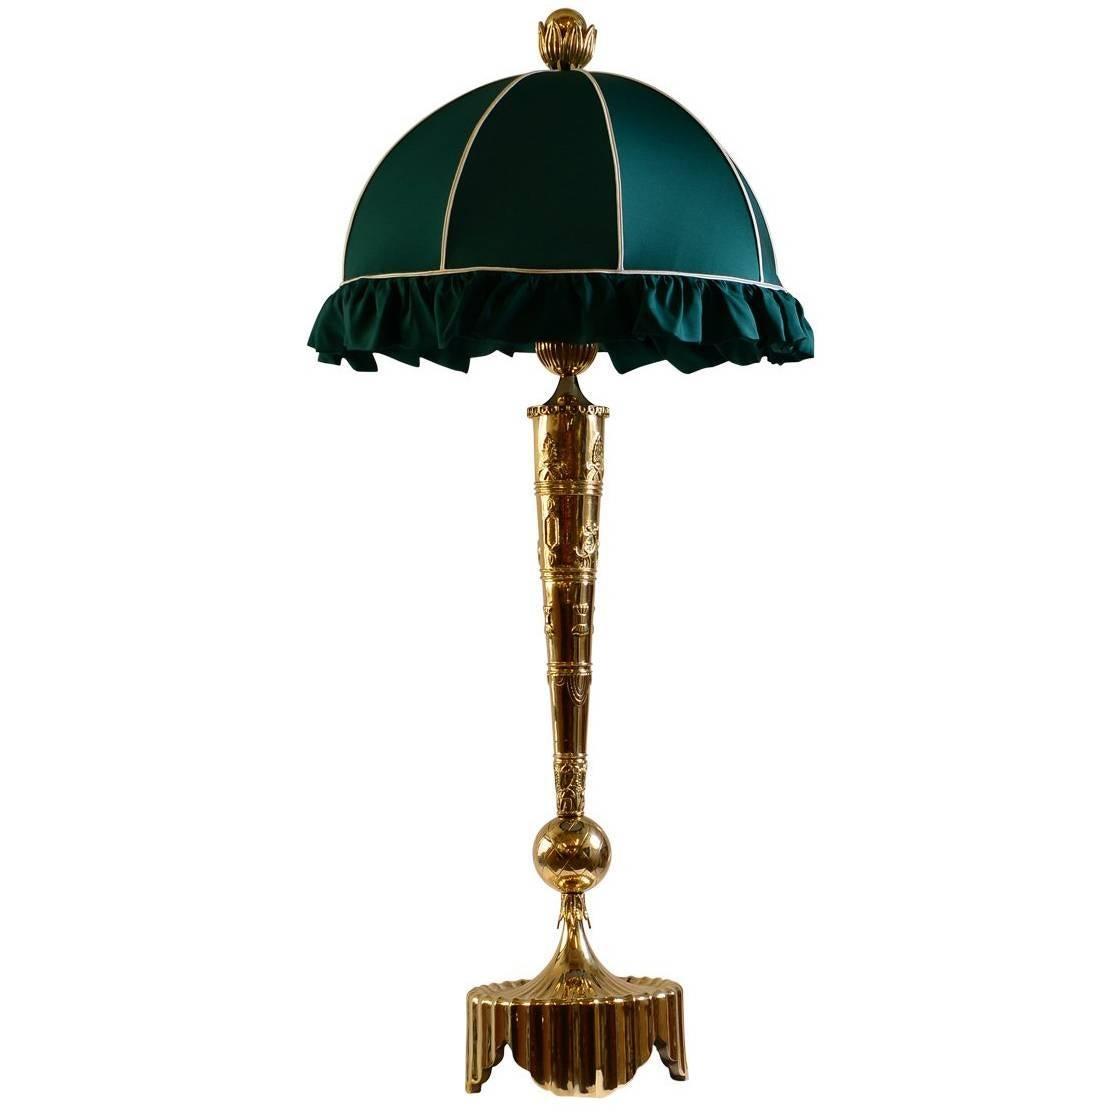 Dagobert Peche Table Lamp for the Wiener Werstaette Re Edition